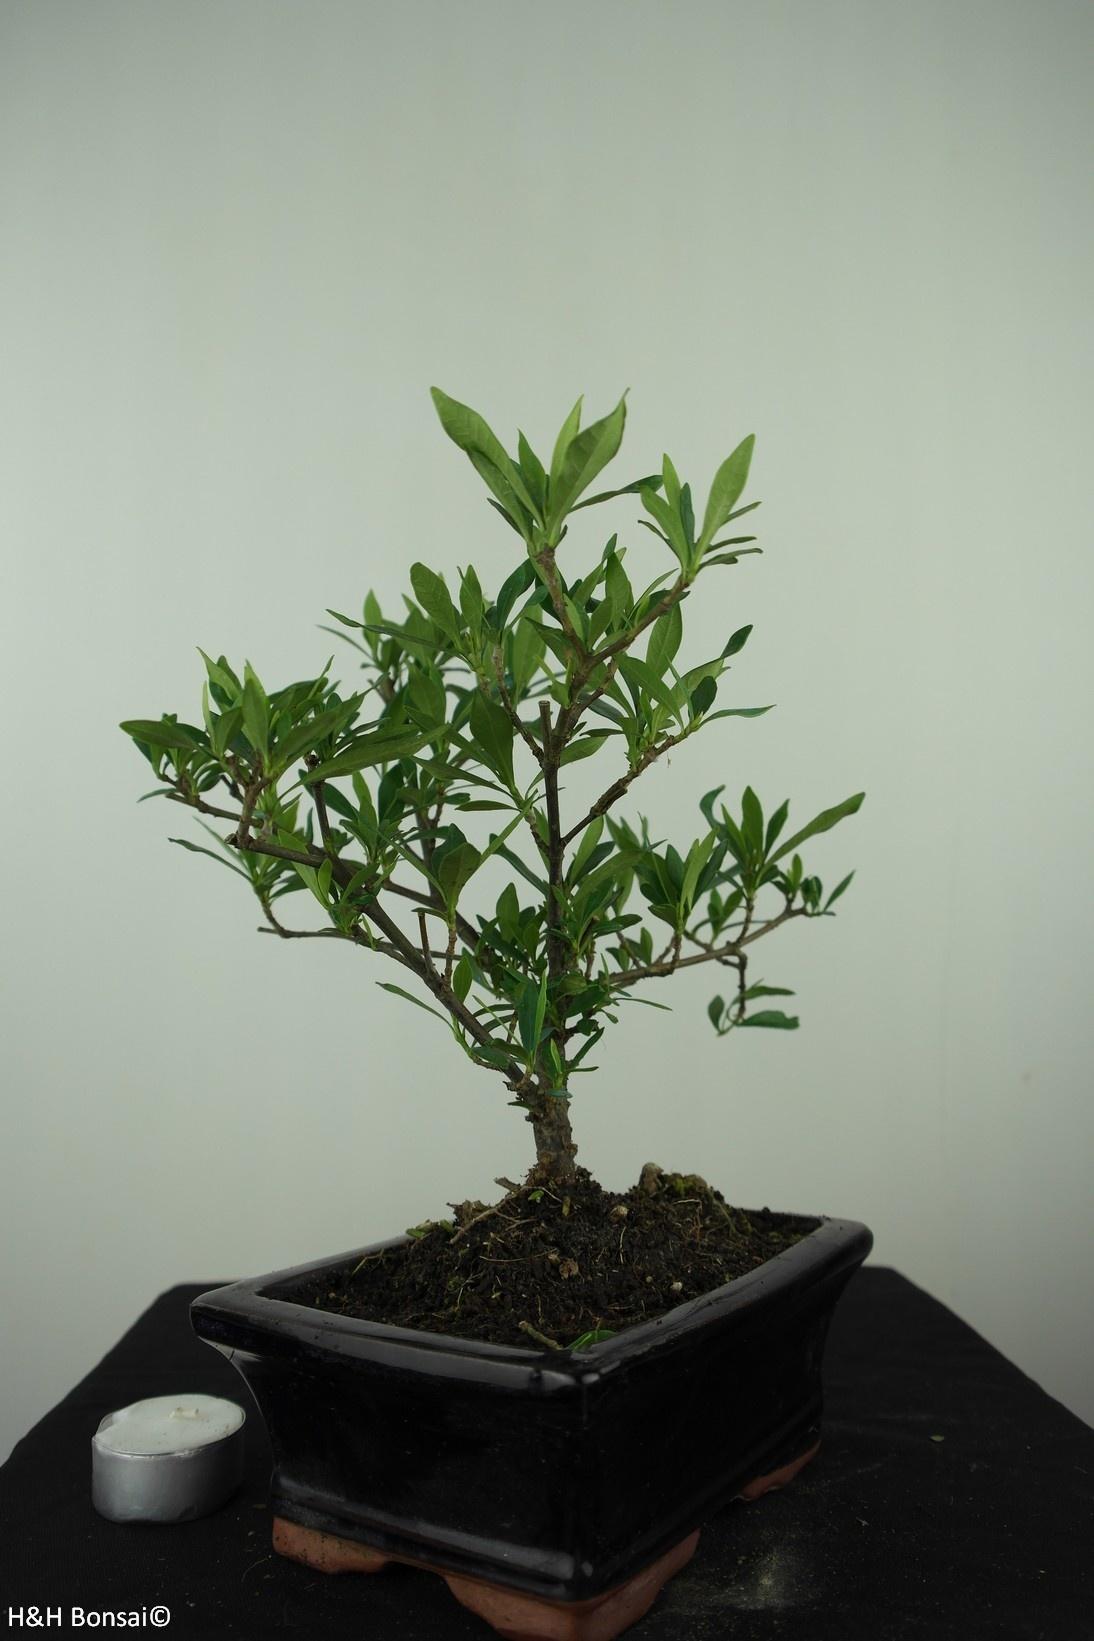 Bonsai Gardenie, Gardenia jasminoides, nr. 7605